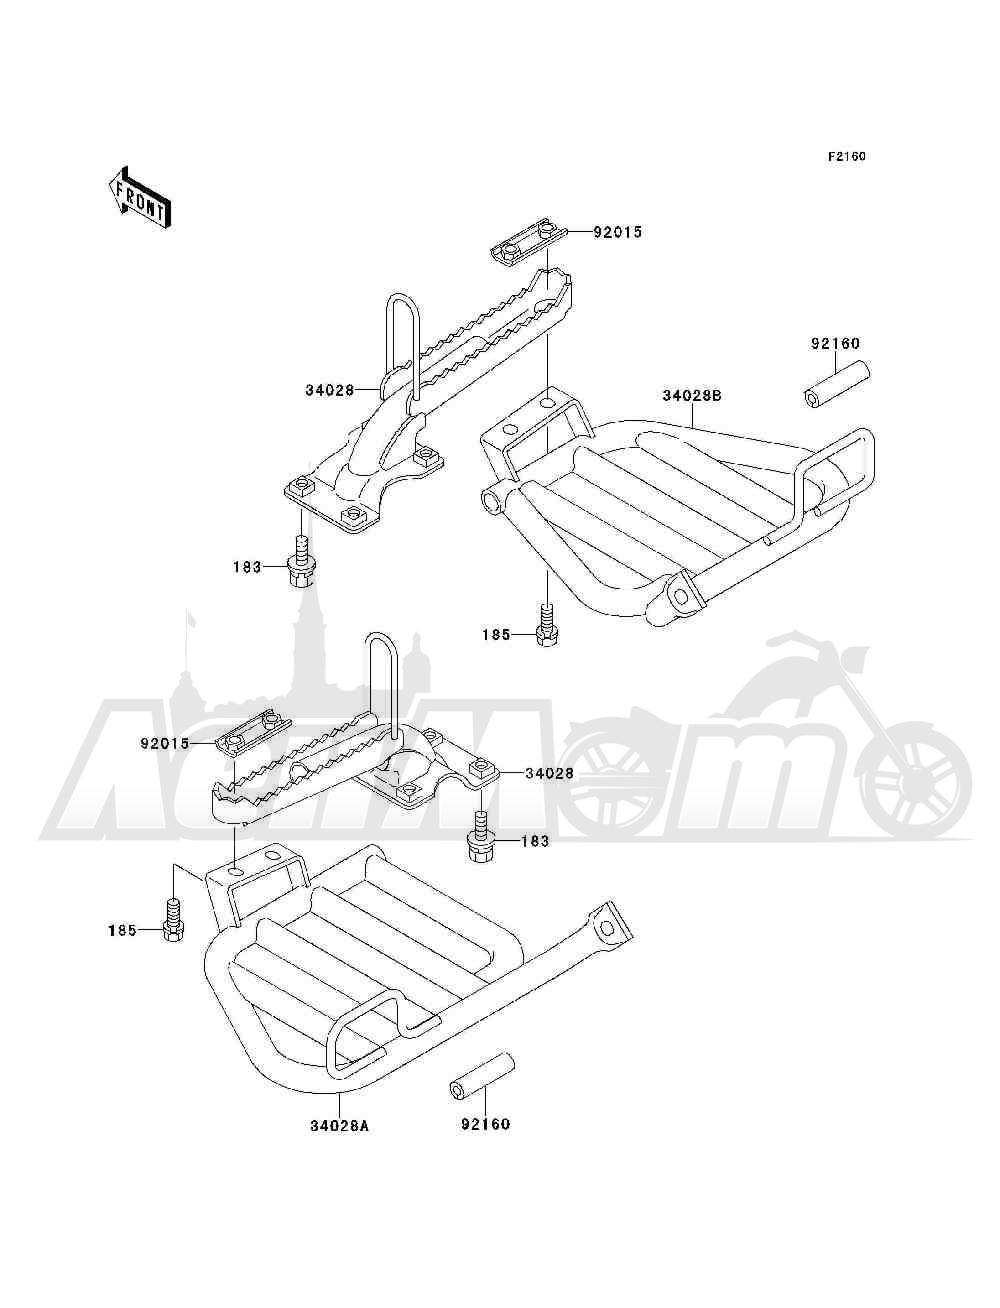 Запчасти для Квадроцикла Kawasaki 1994 BAYOU 300 4X4 (KLF300-C6) Раздел: FOOTRESTS   подножки